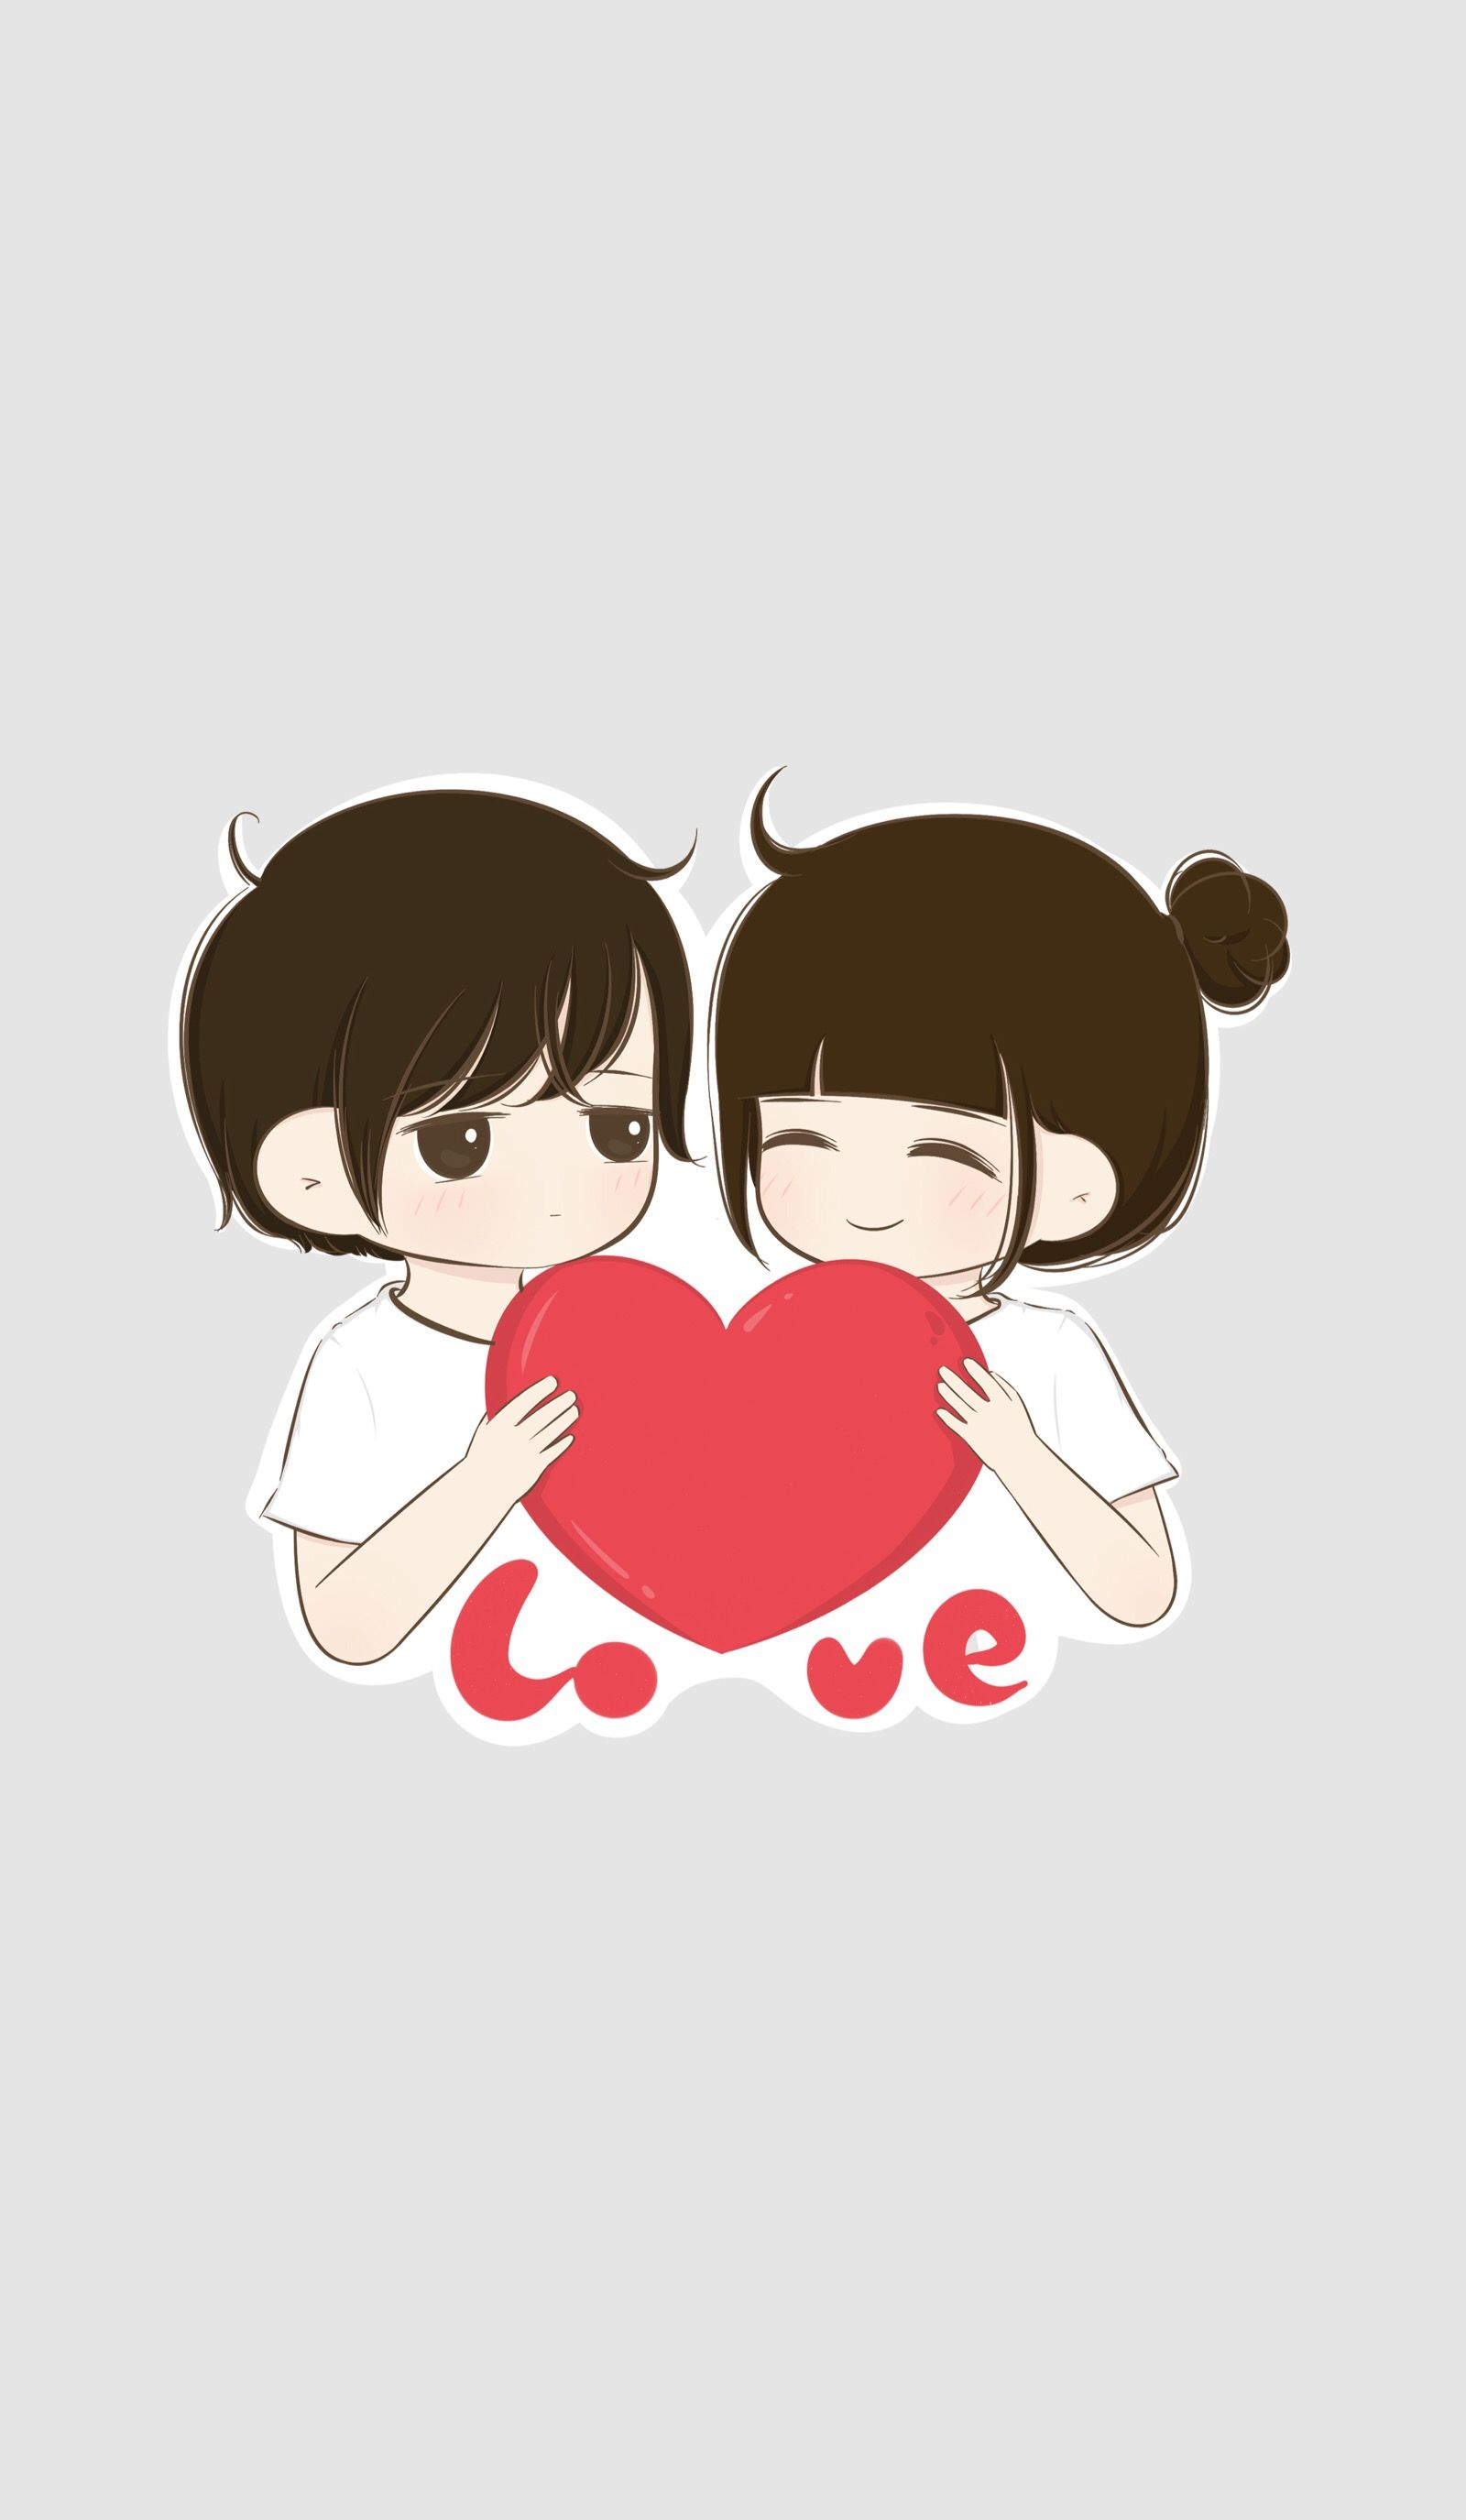 Pin By Talha On Love Pinterest Love Cartoon Couple Cute